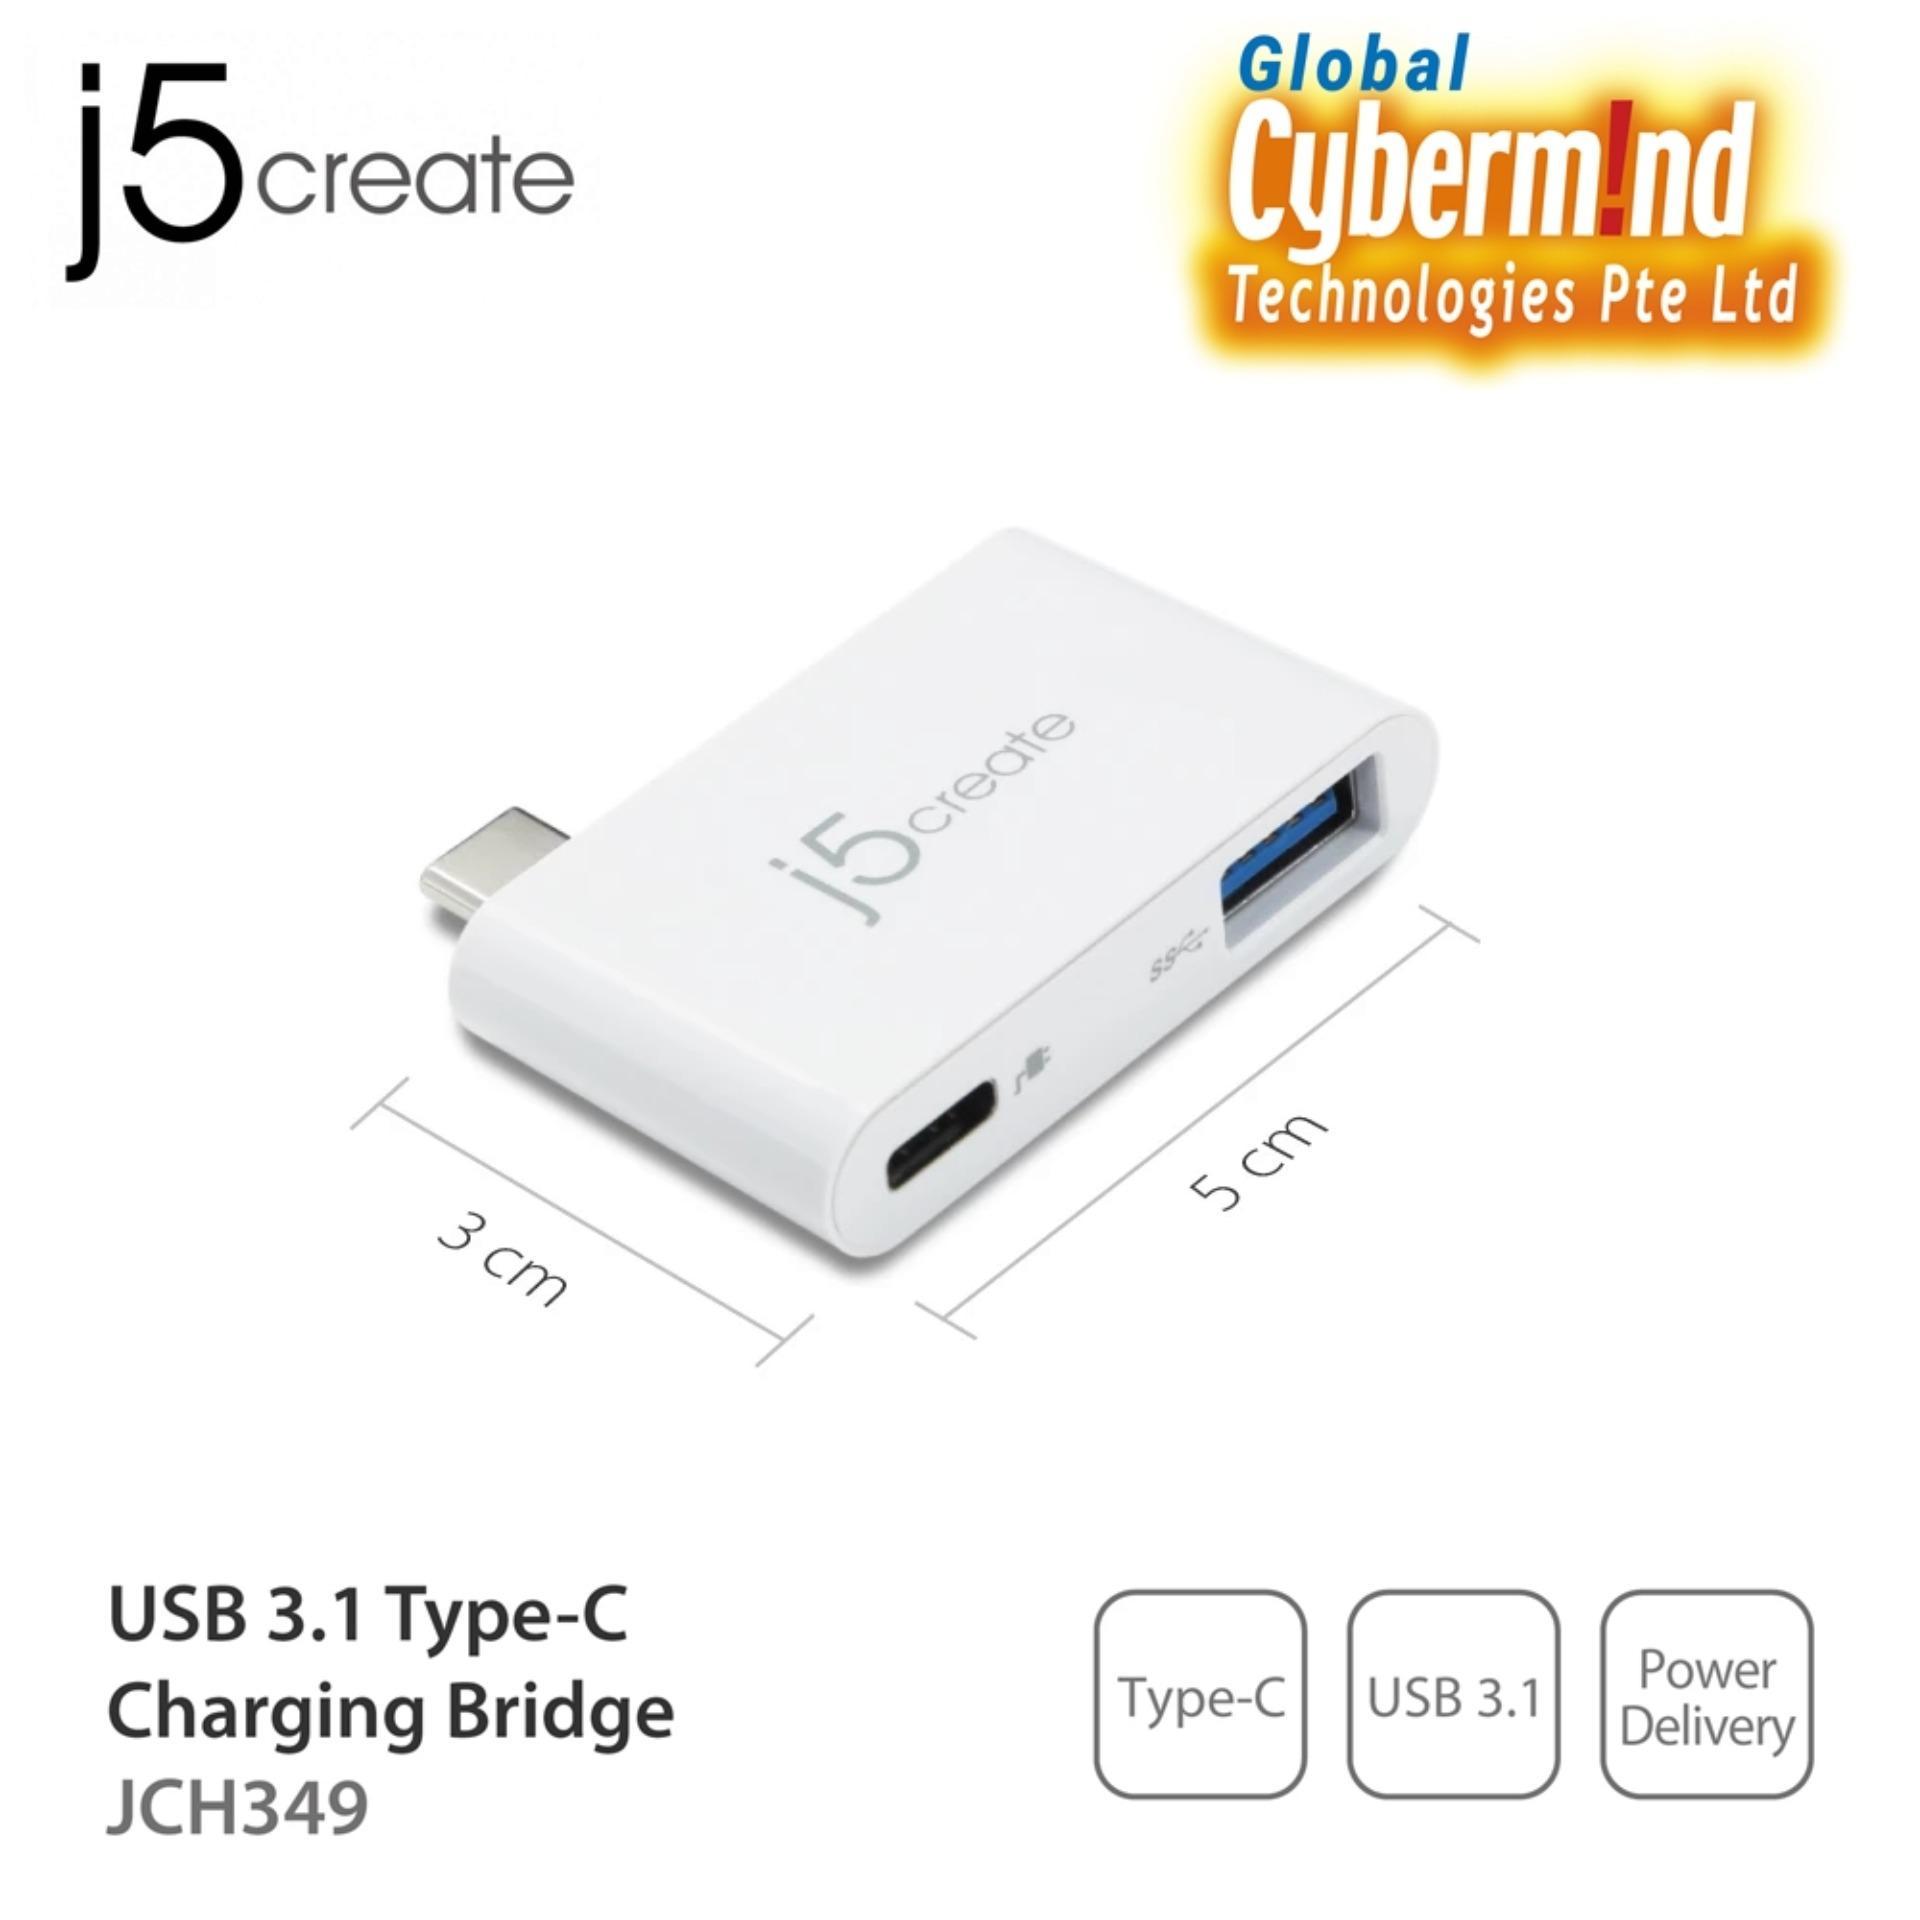 J5Create JCH349 USB 3 1 TYPE-C CHARGING BRIDGE (Local Distributor Stocks)